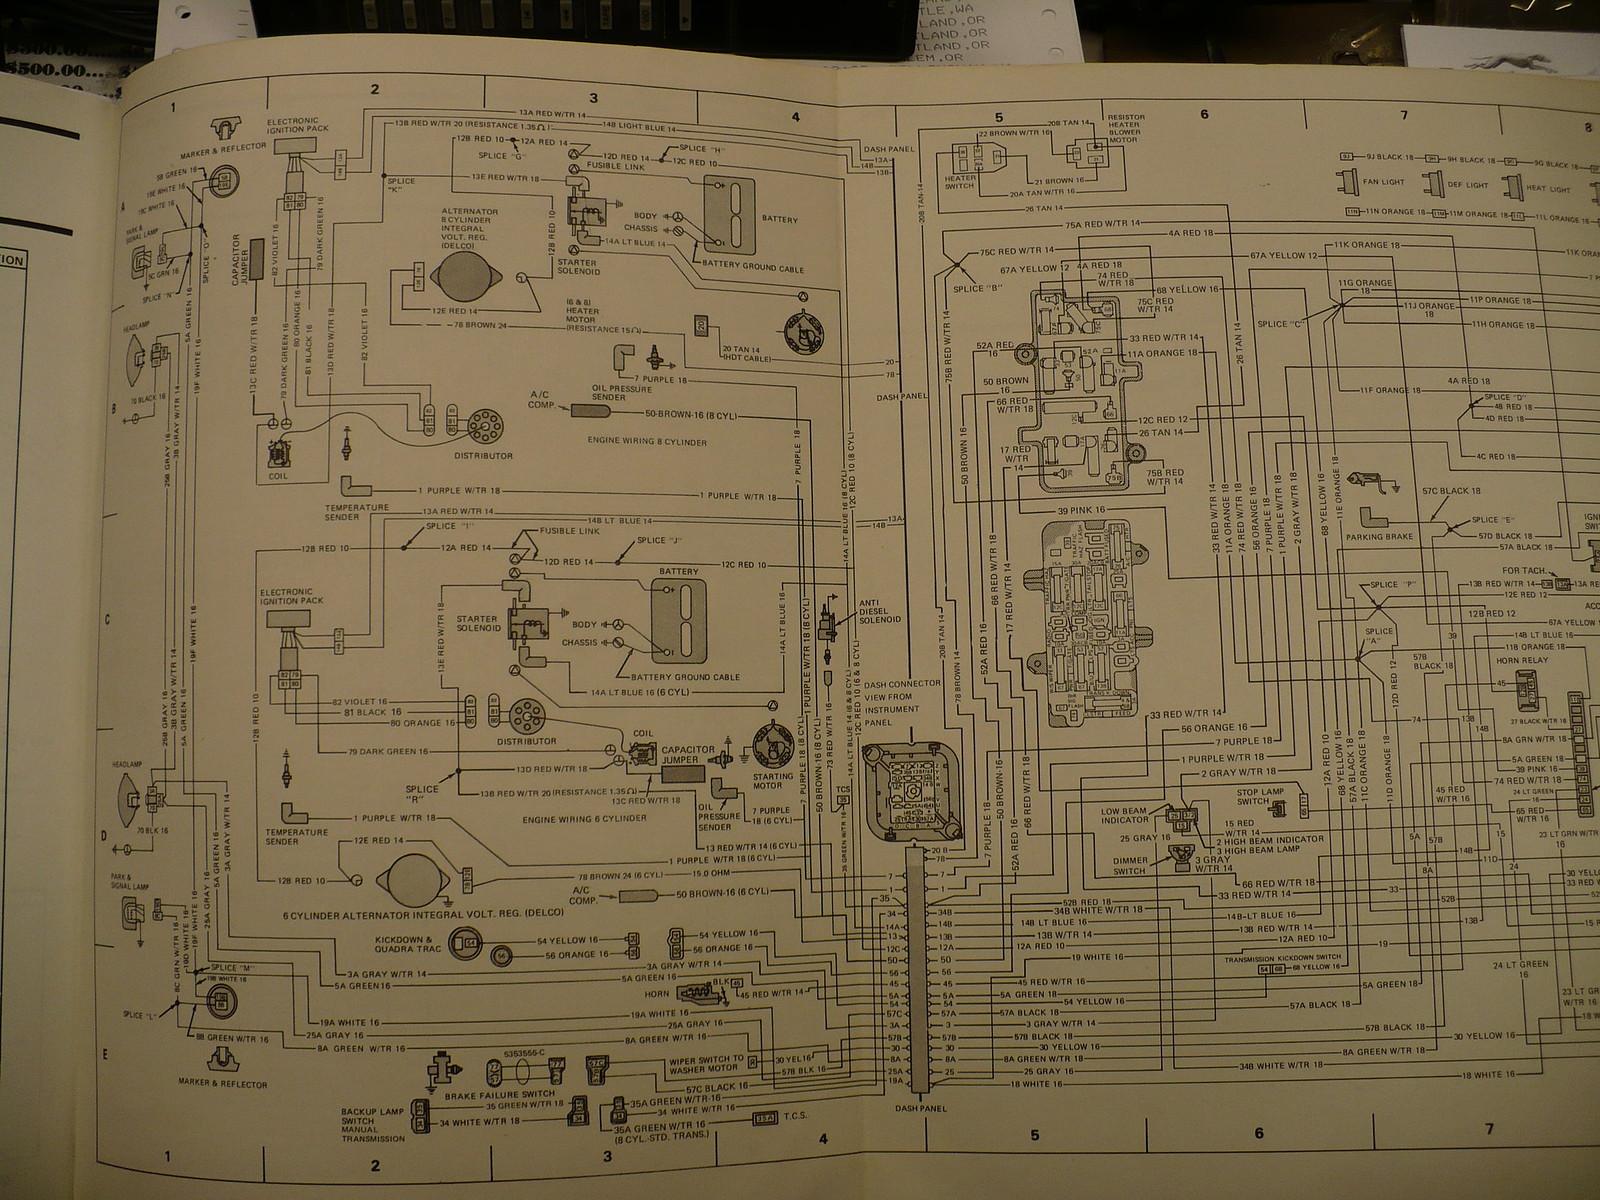 1978 cj 5 wiring diagram needed! - JeepForum.com